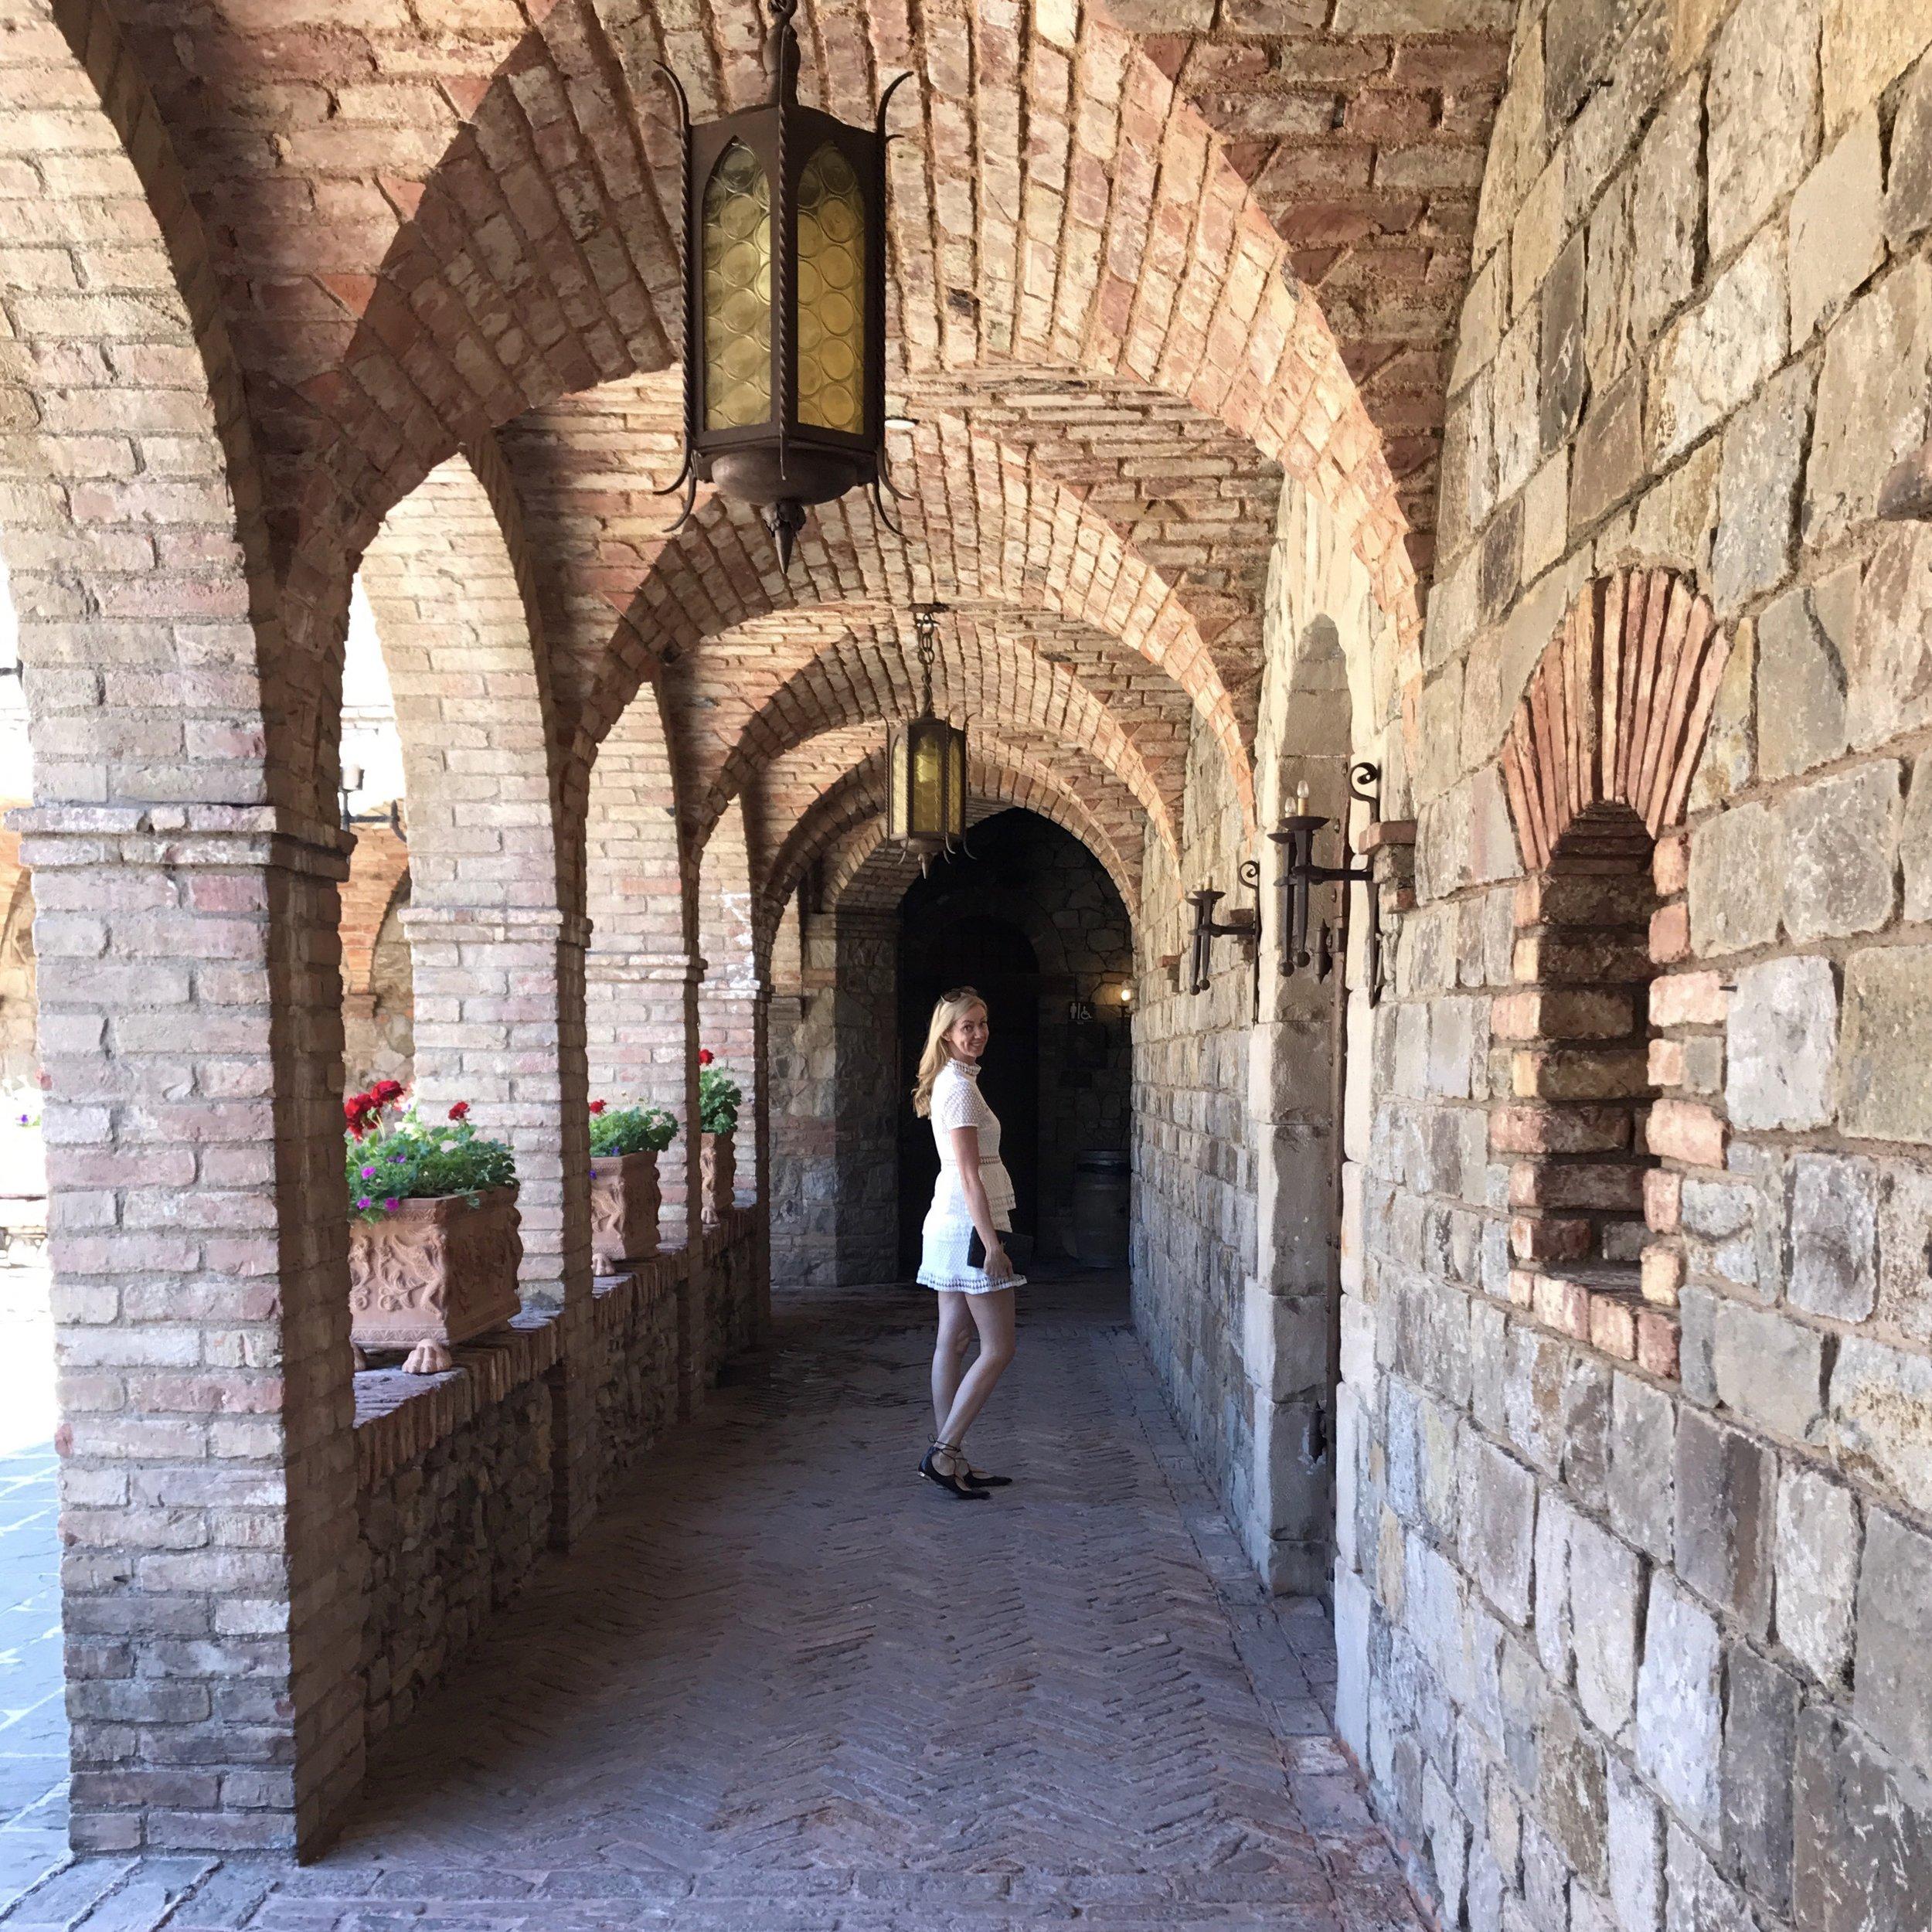 Castello-di-Amorosa-napa-valley-rachel-with-love-and-style-blog-3.jpg